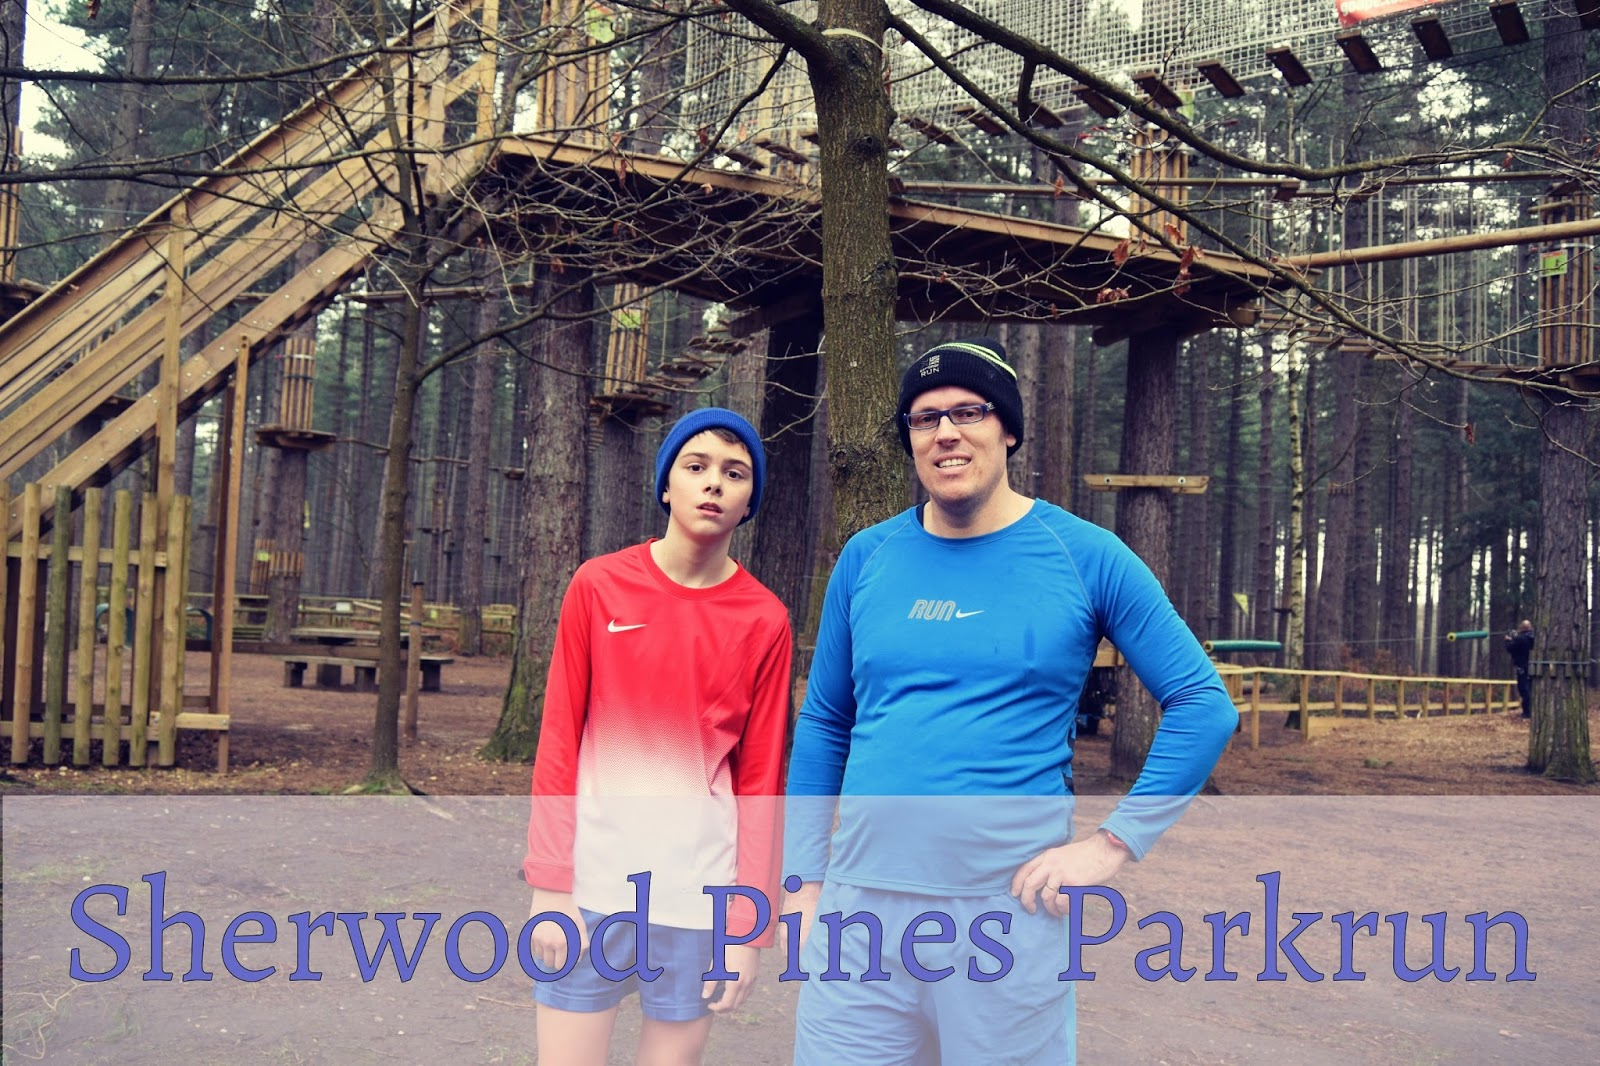 Sherwood Pines Parkrun: Saturday Morning Run & Fun